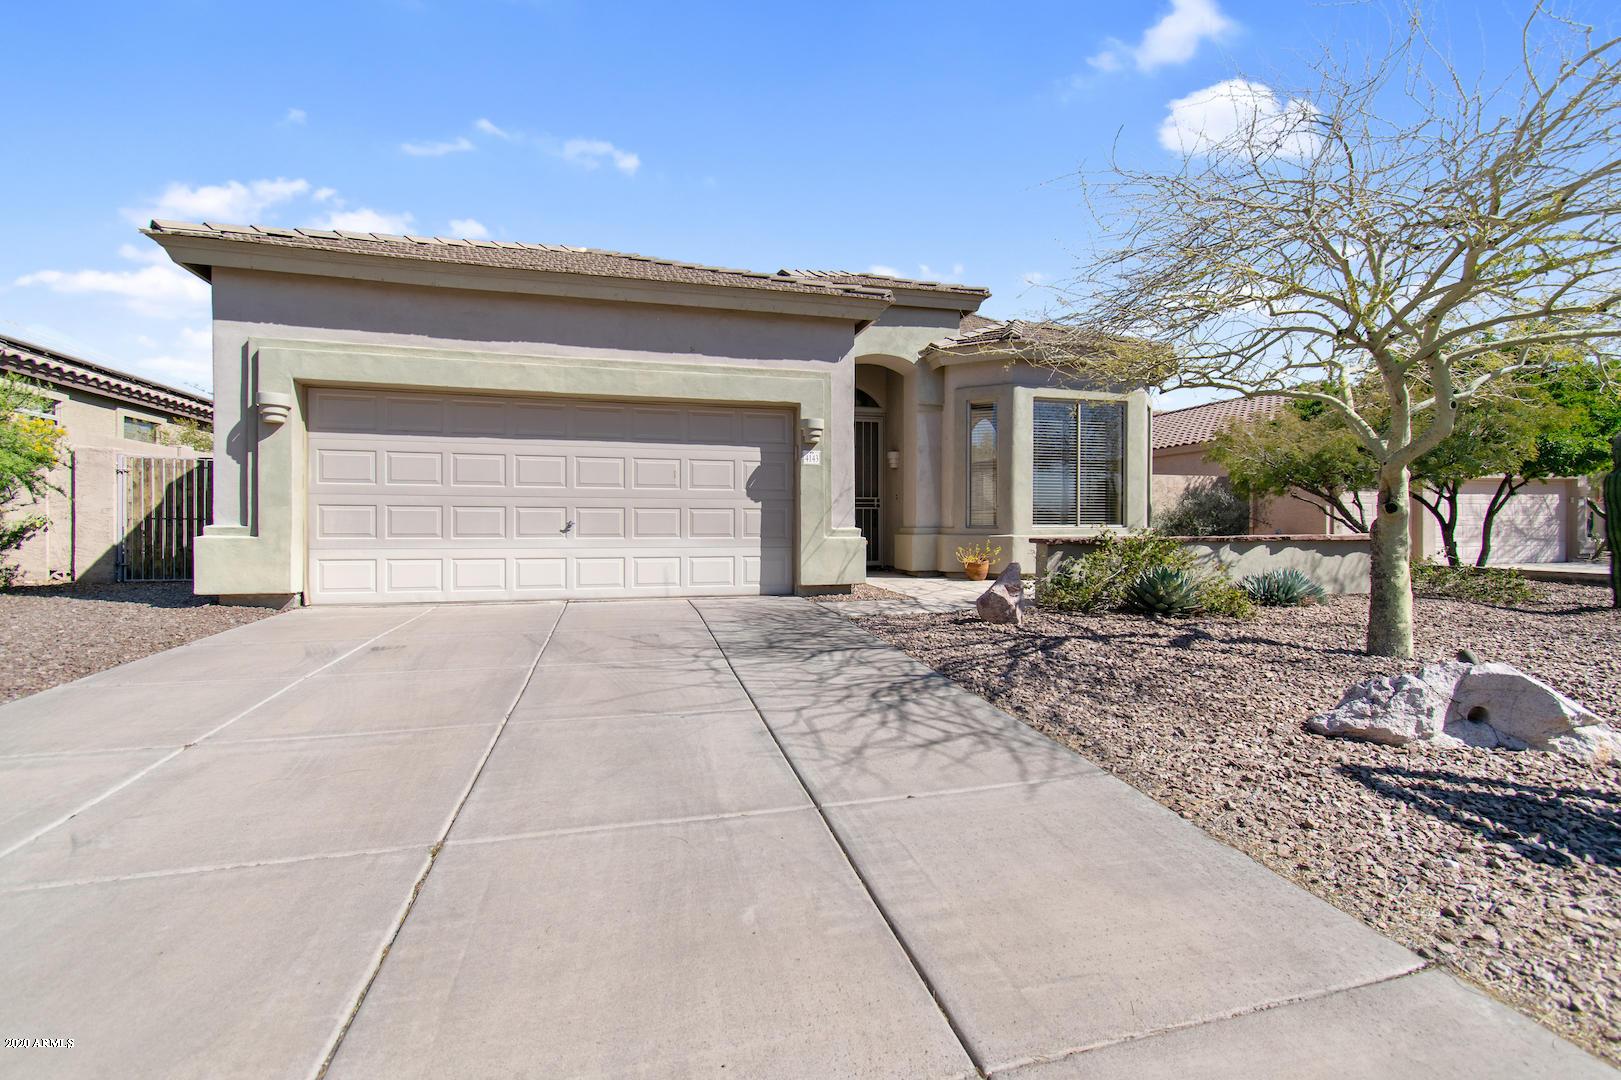 Photo of 4143 N STARRY PASS Circle, Mesa, AZ 85207